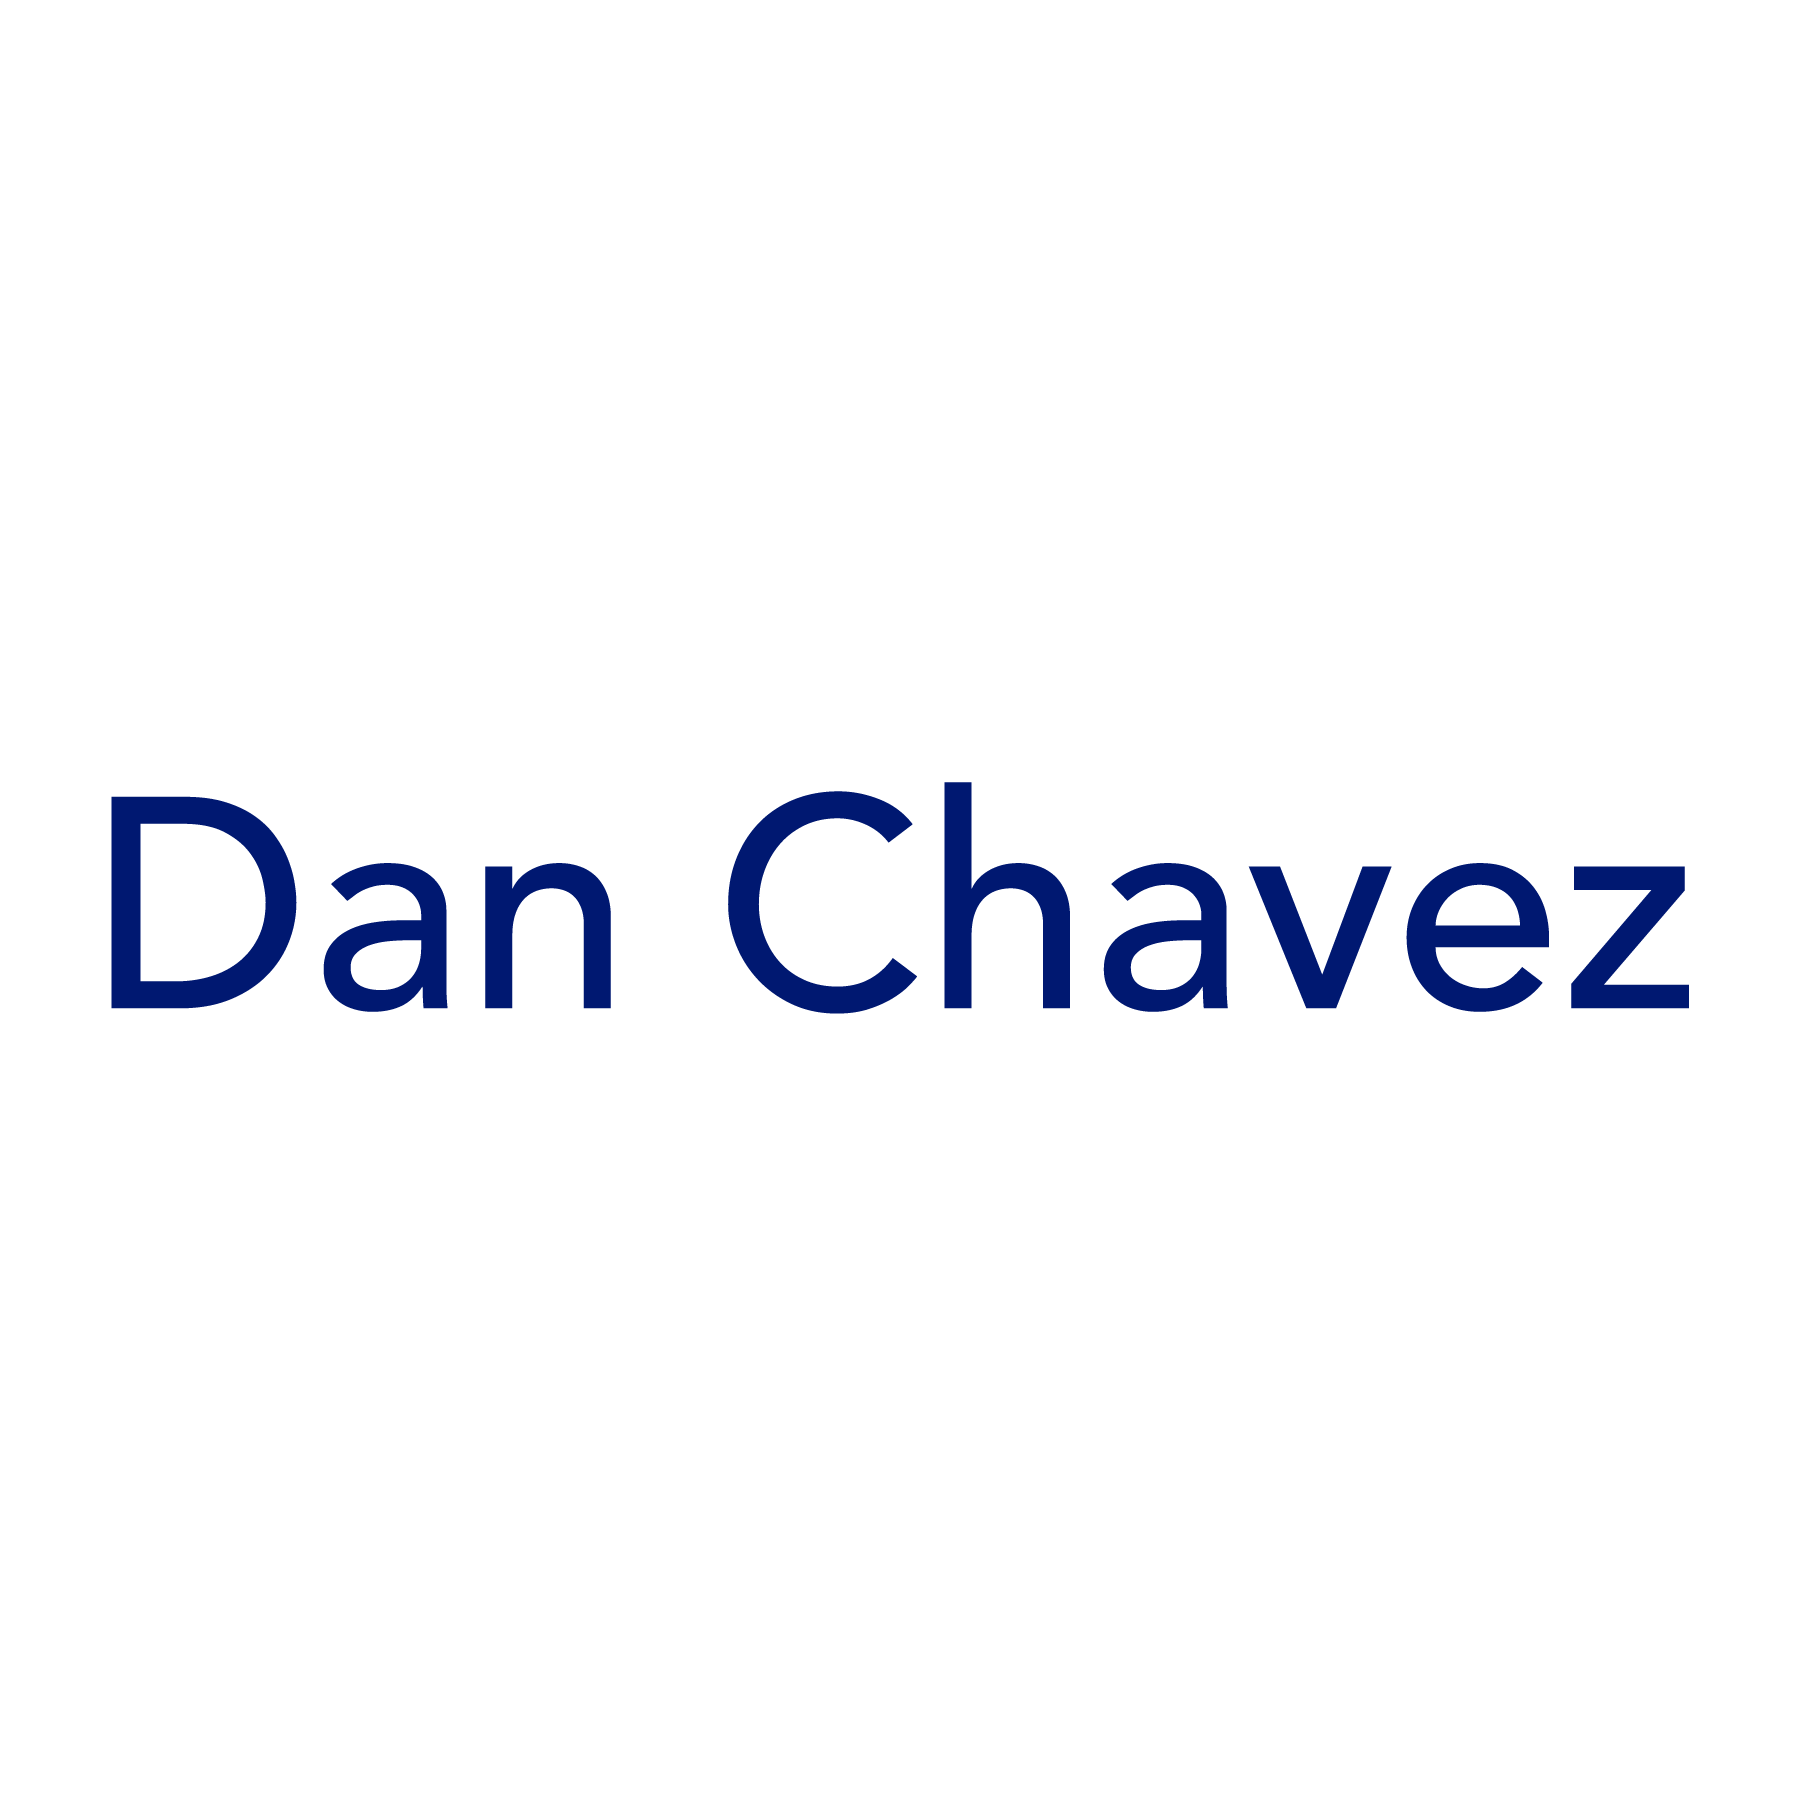 Dan Chavez